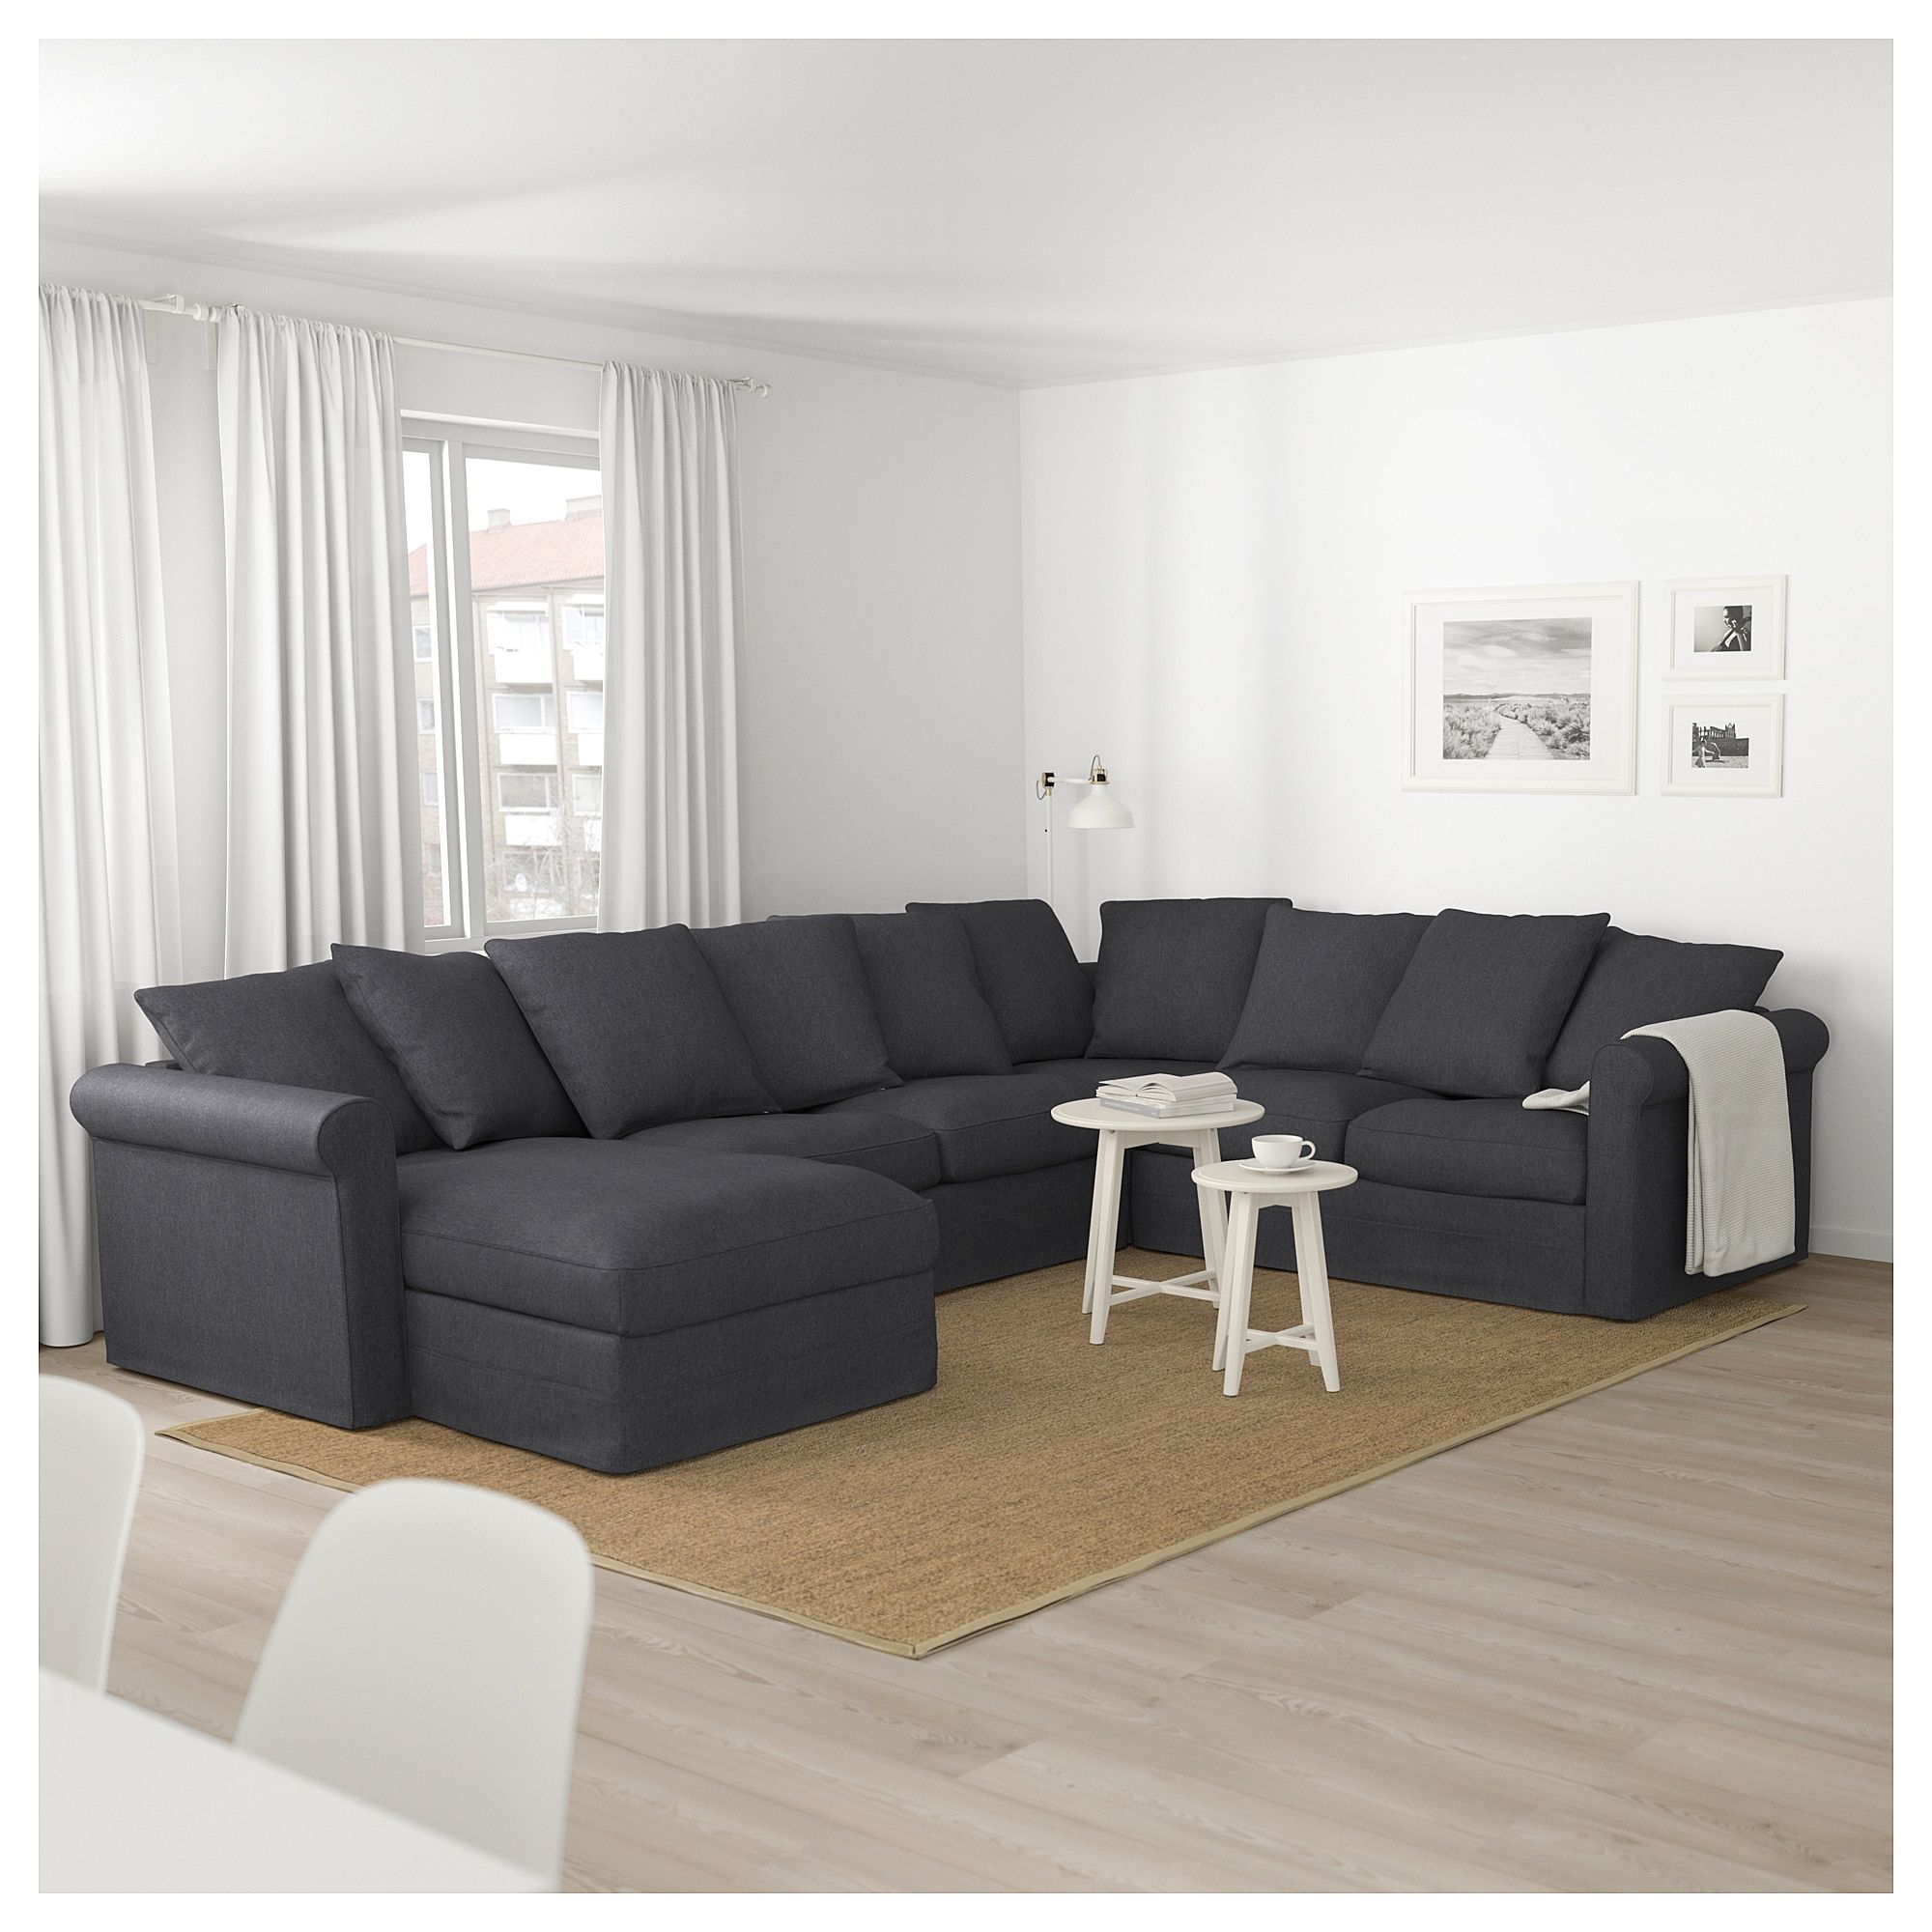 Ikea Gronlid Sectional 5 Seat Corner With Chaise Sporda Dark Gray Corner Sofa Living Room Ikea Corner Sofa Ikea Living Room